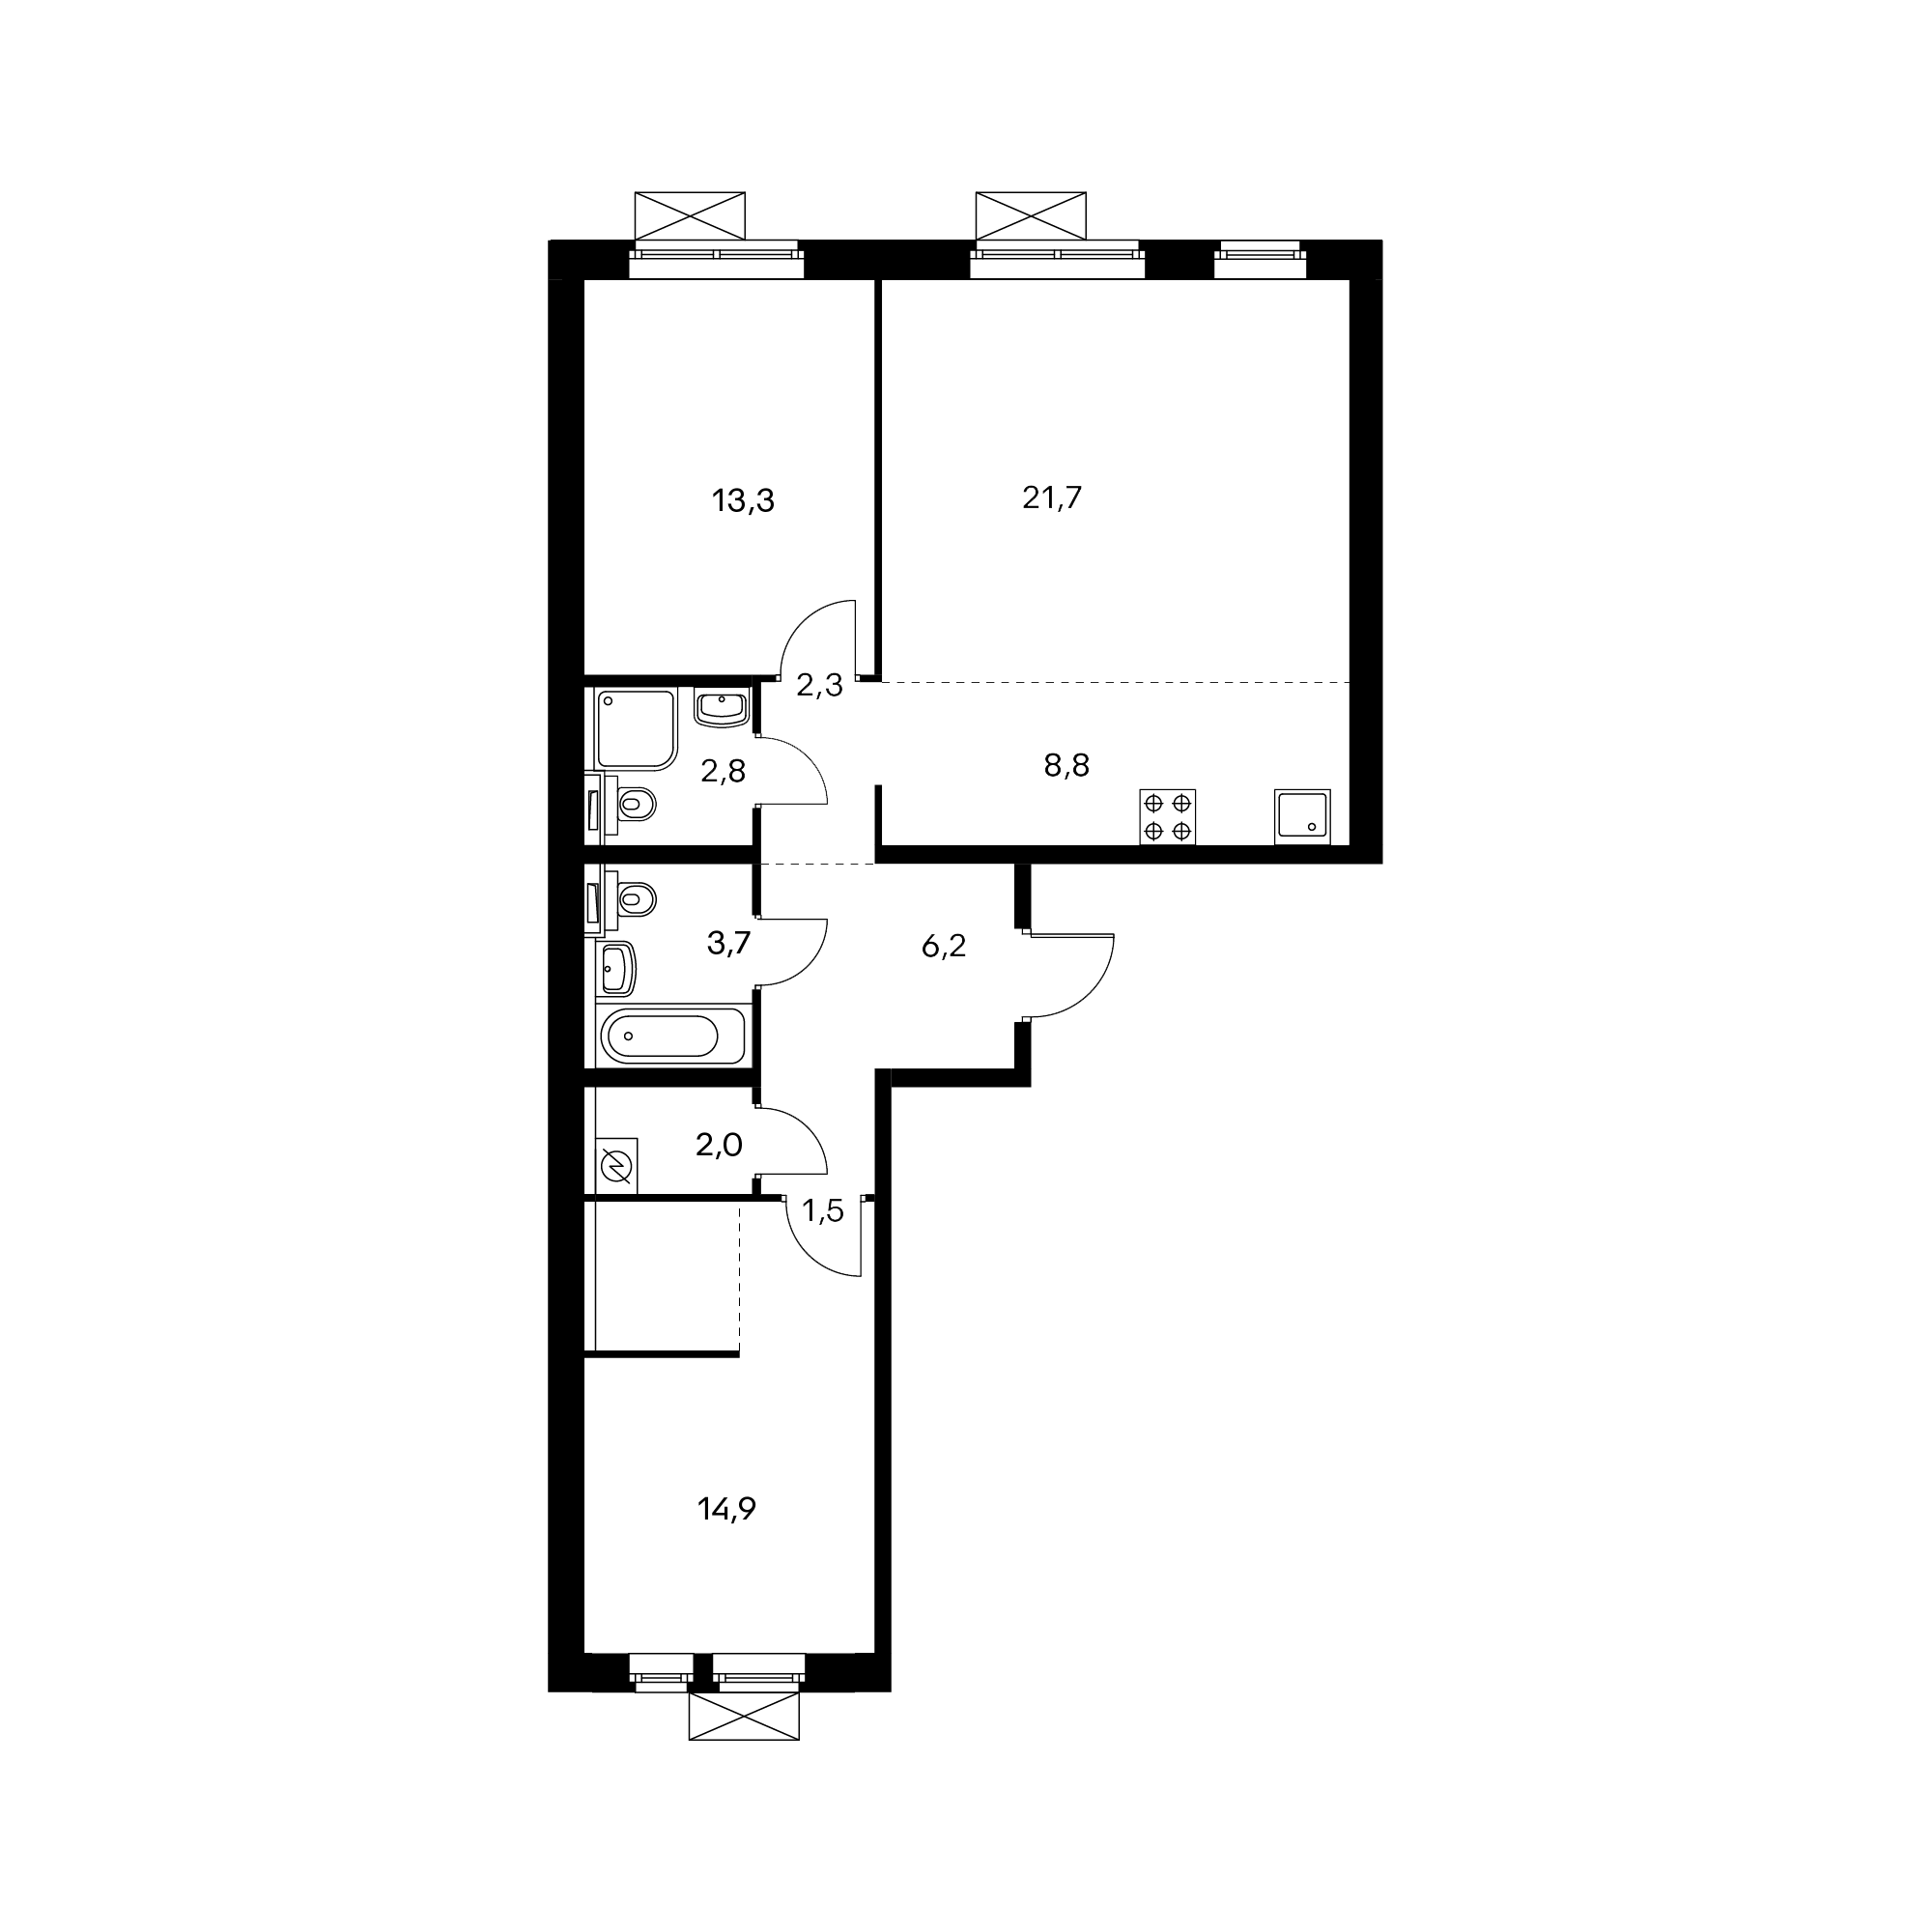 3NM12_8.4-1_1